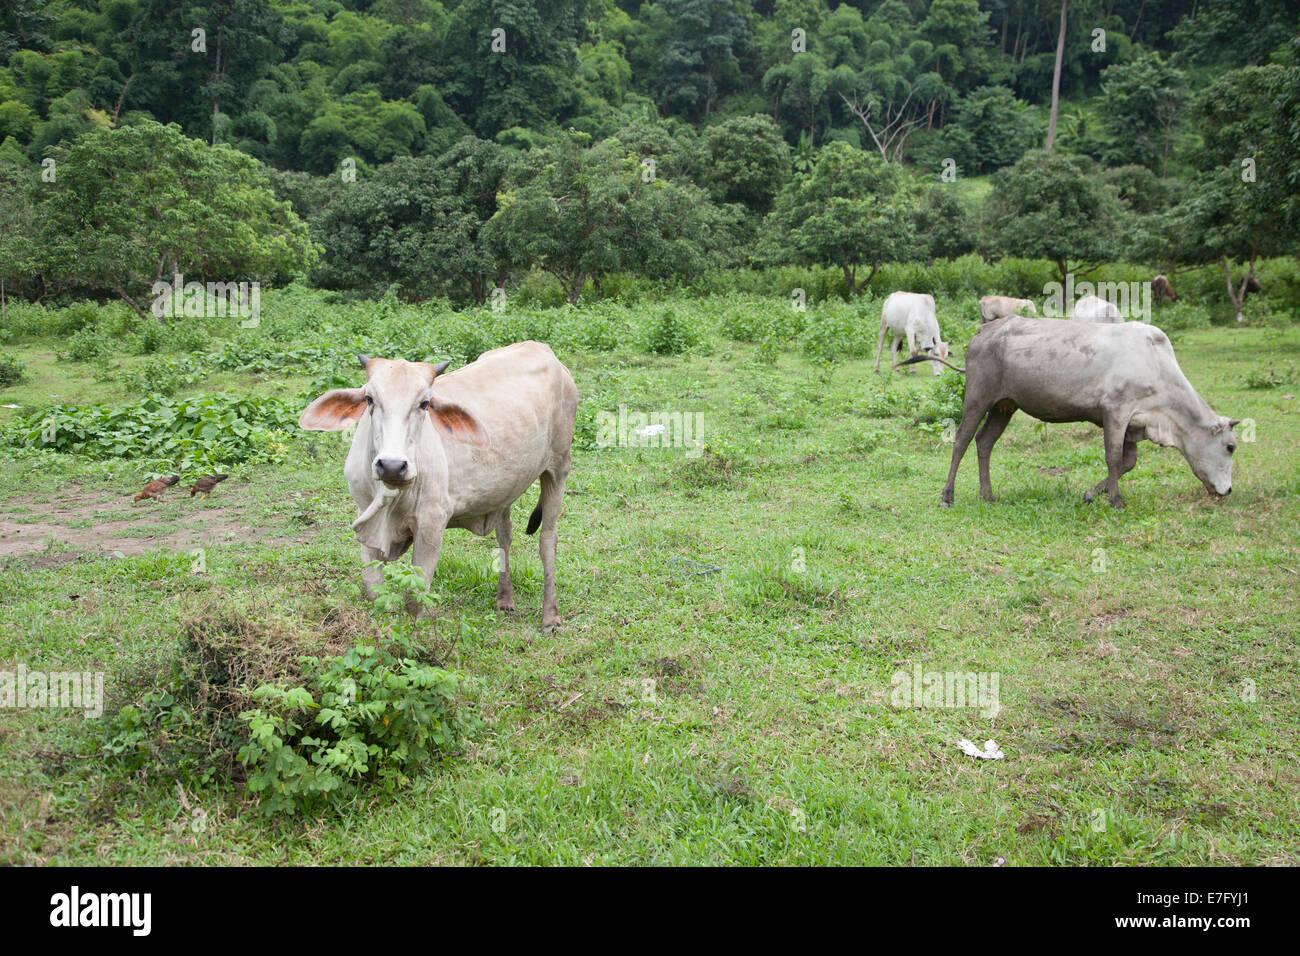 jungle, forest, plant, ecosystem, Tahiland, Asian, heat, humidity - Stock Image